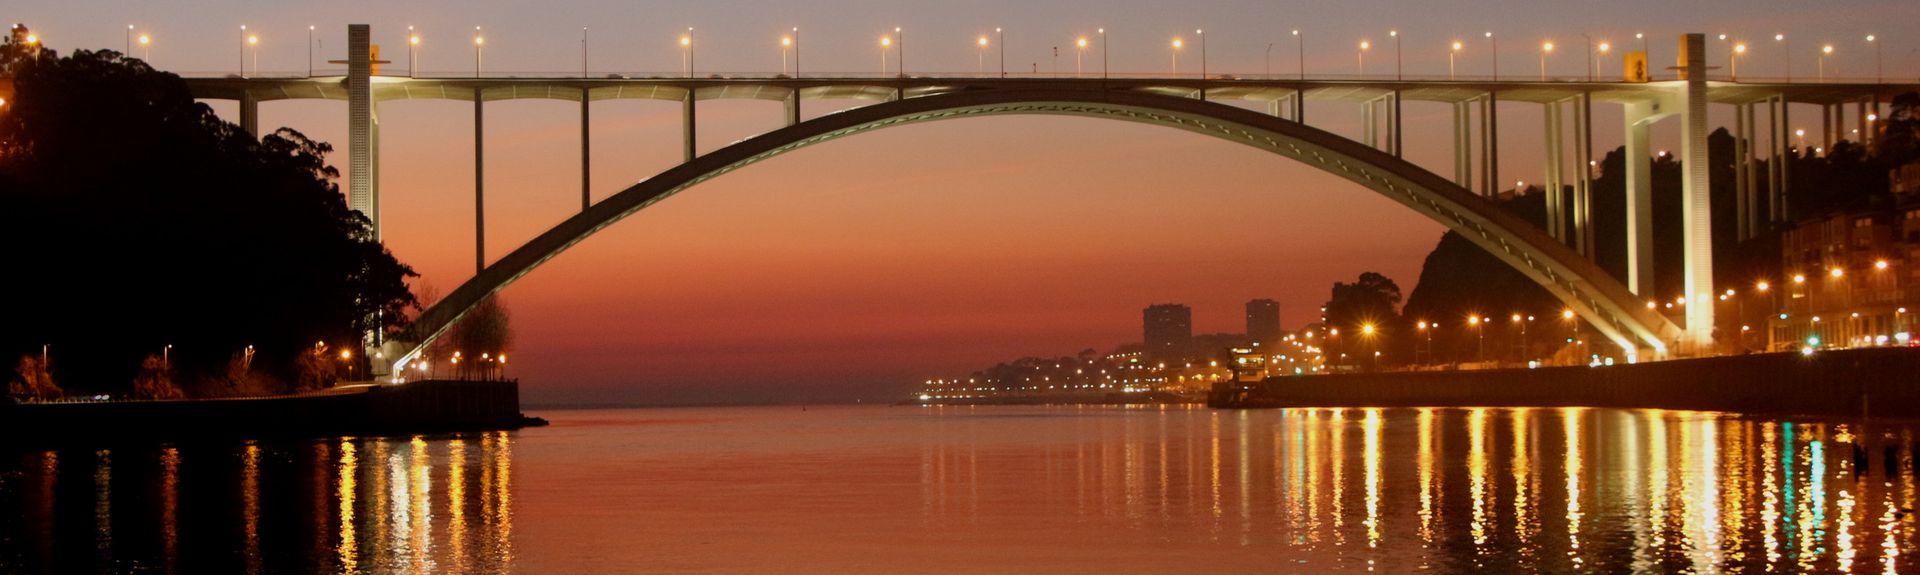 Universidade do Porto, Porto, Distrito de Porto, Portugal